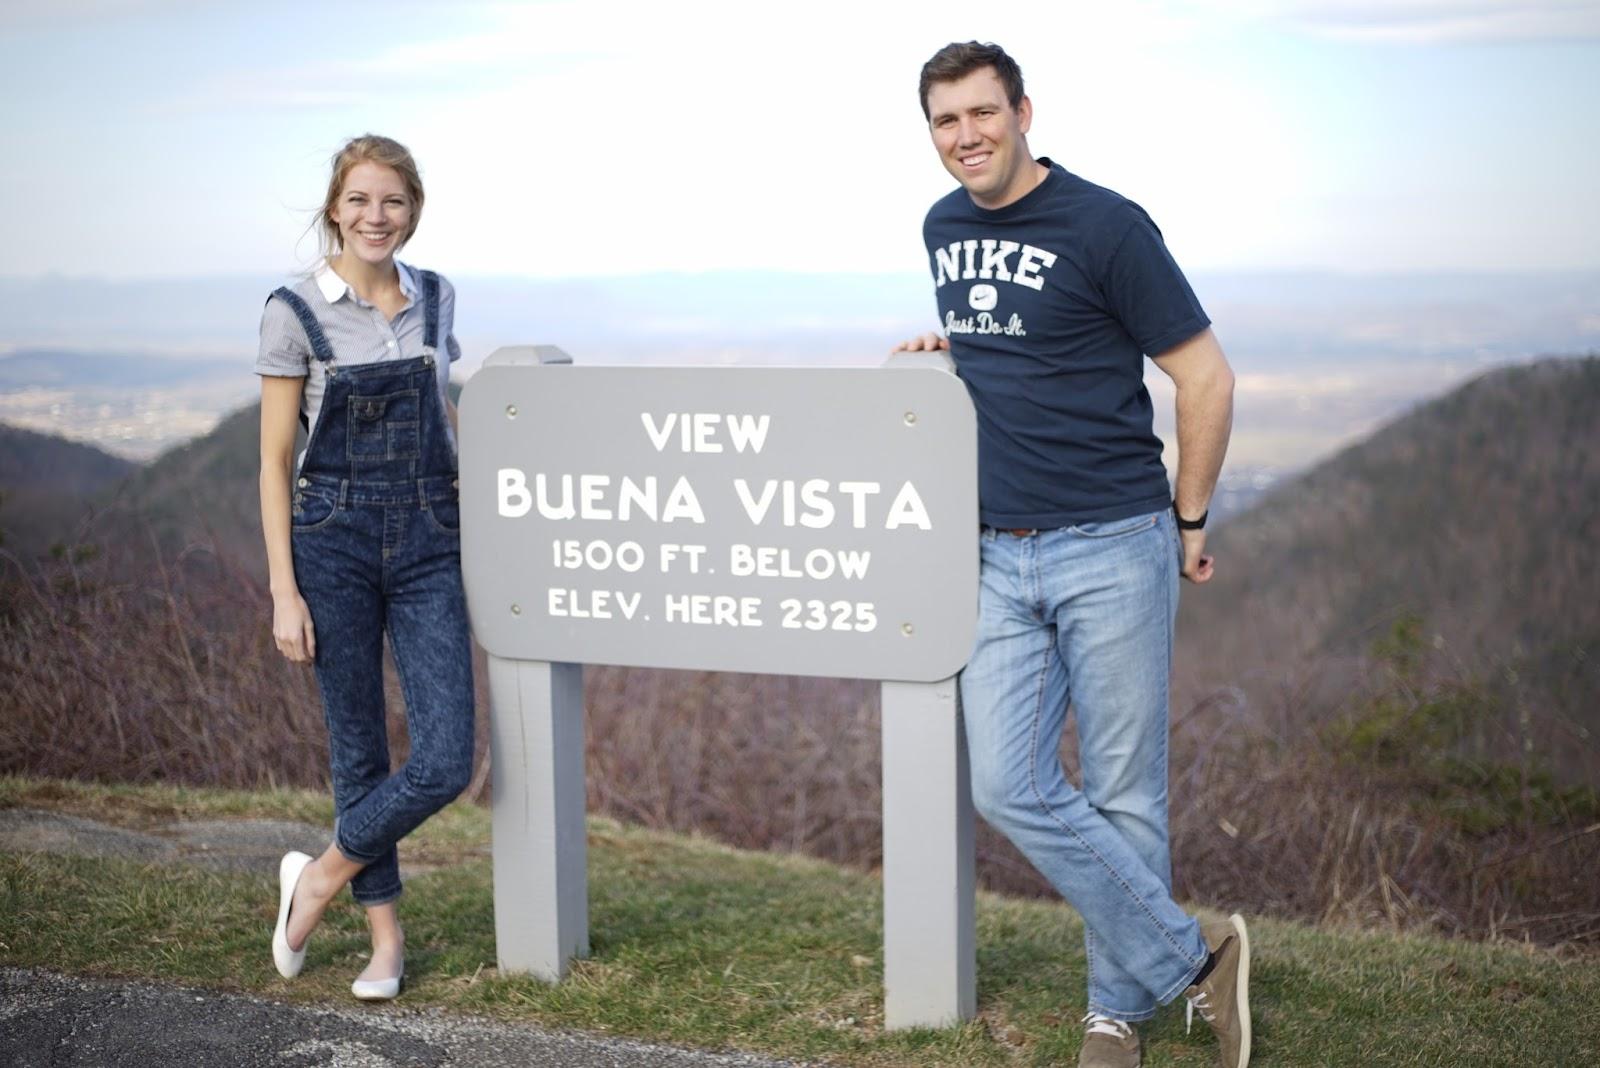 Buena Vista Blue Ridge Parkway